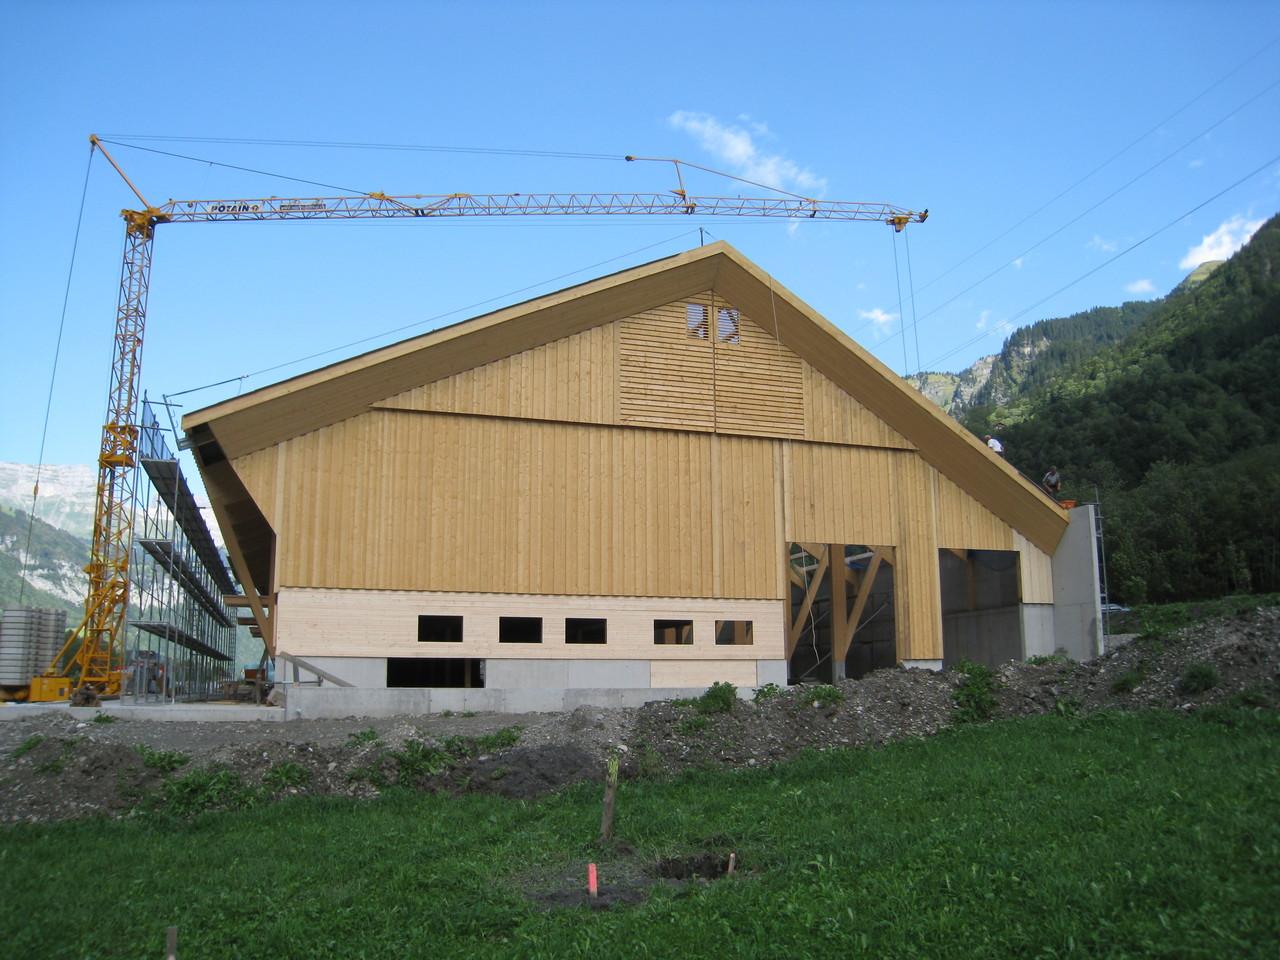 Stall 2008, Linthal